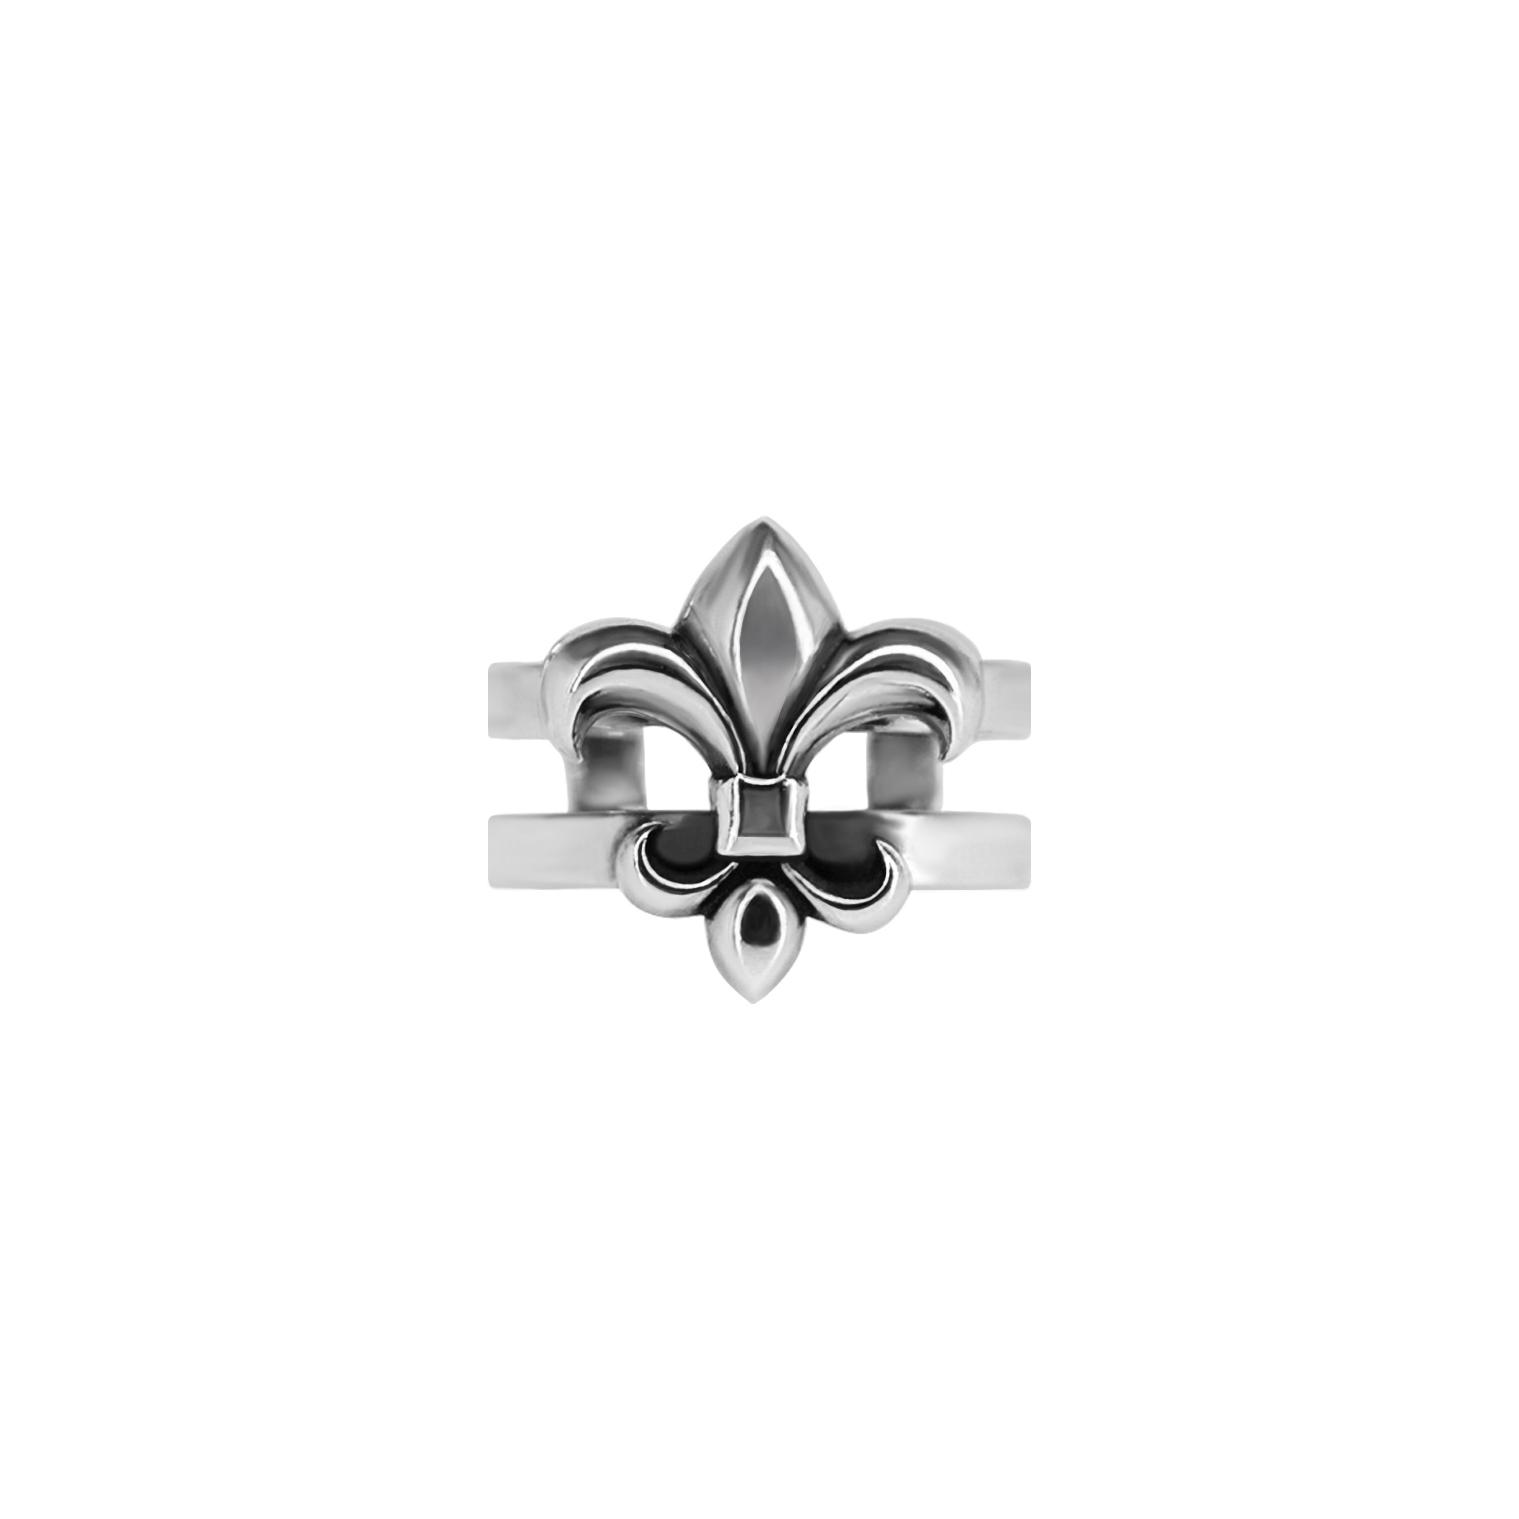 Mid finger ring Fleur de lis, sterling silver